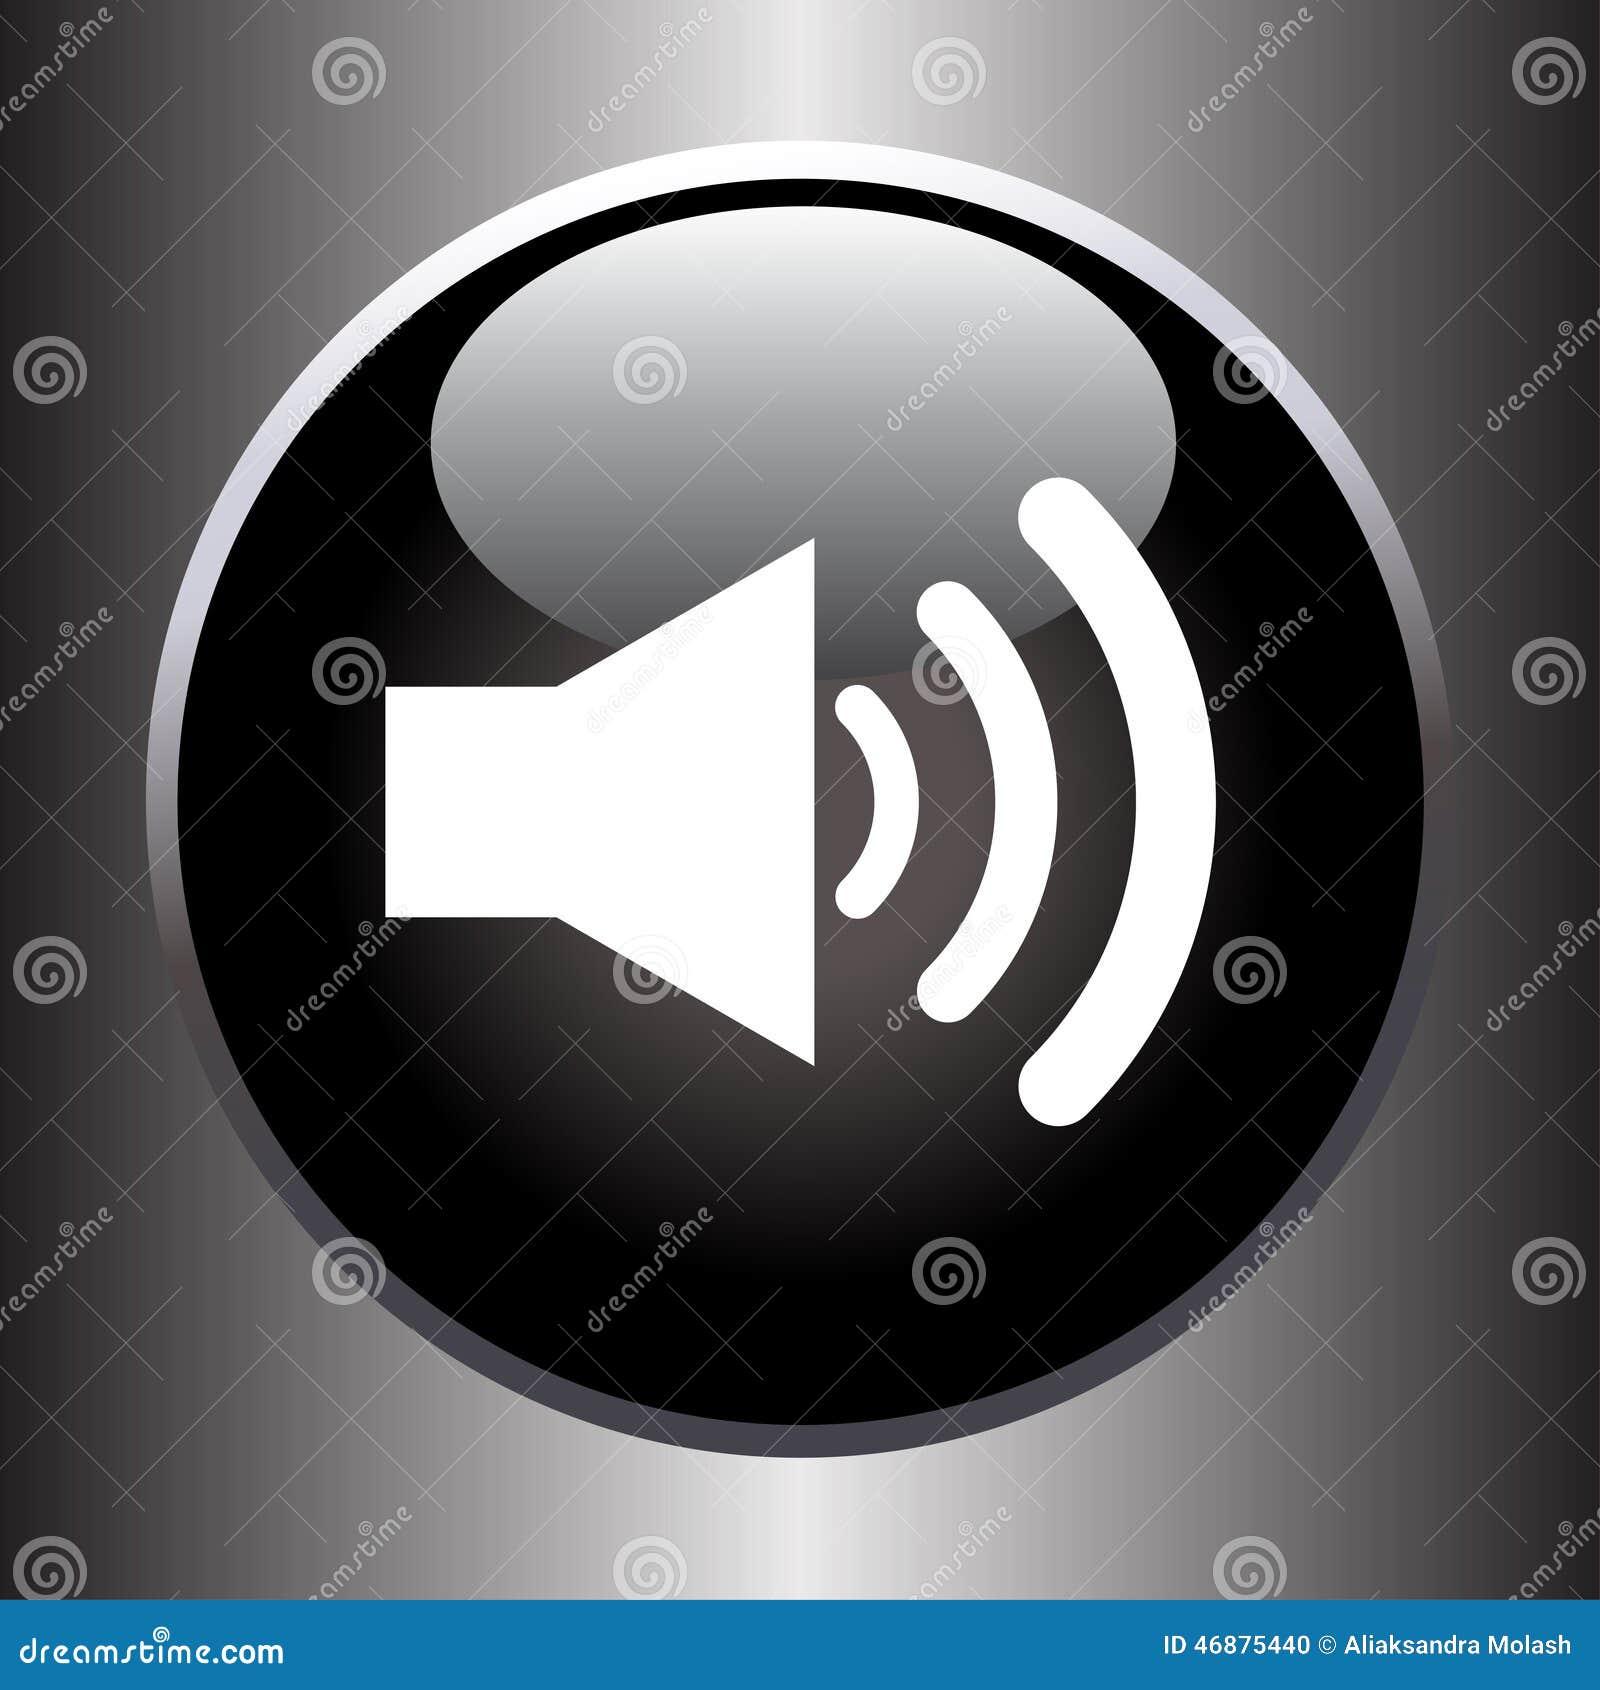 Speaker volume icon on black glass button